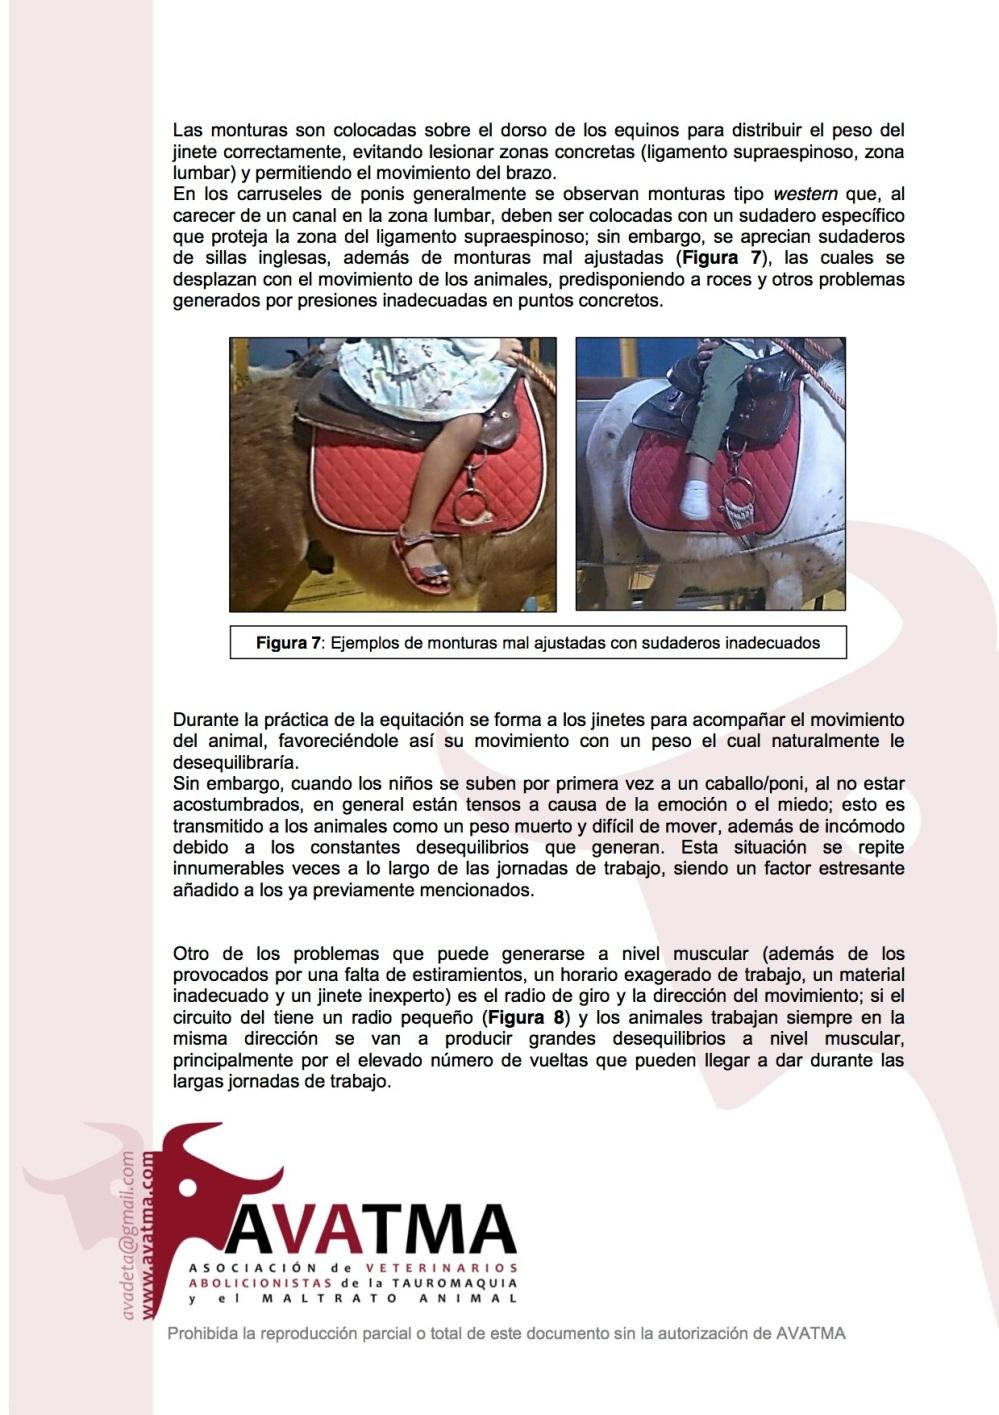 Informe carruseles ponis5